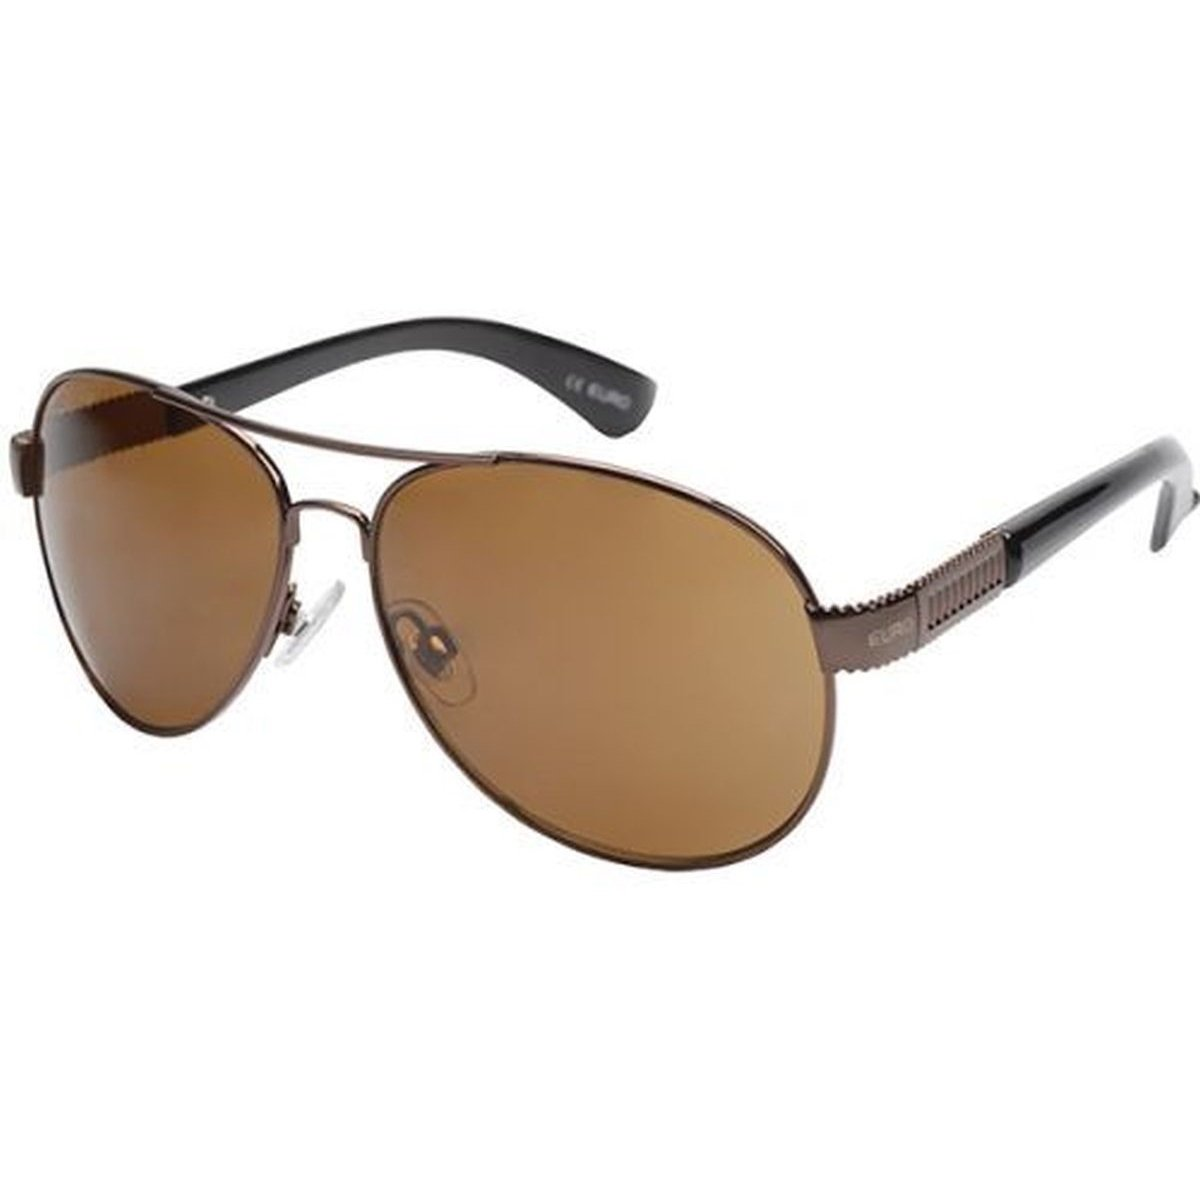 7f80c2dcd Óculos De Sol Euro Feminino - Oc068eu/3M | Netshoes